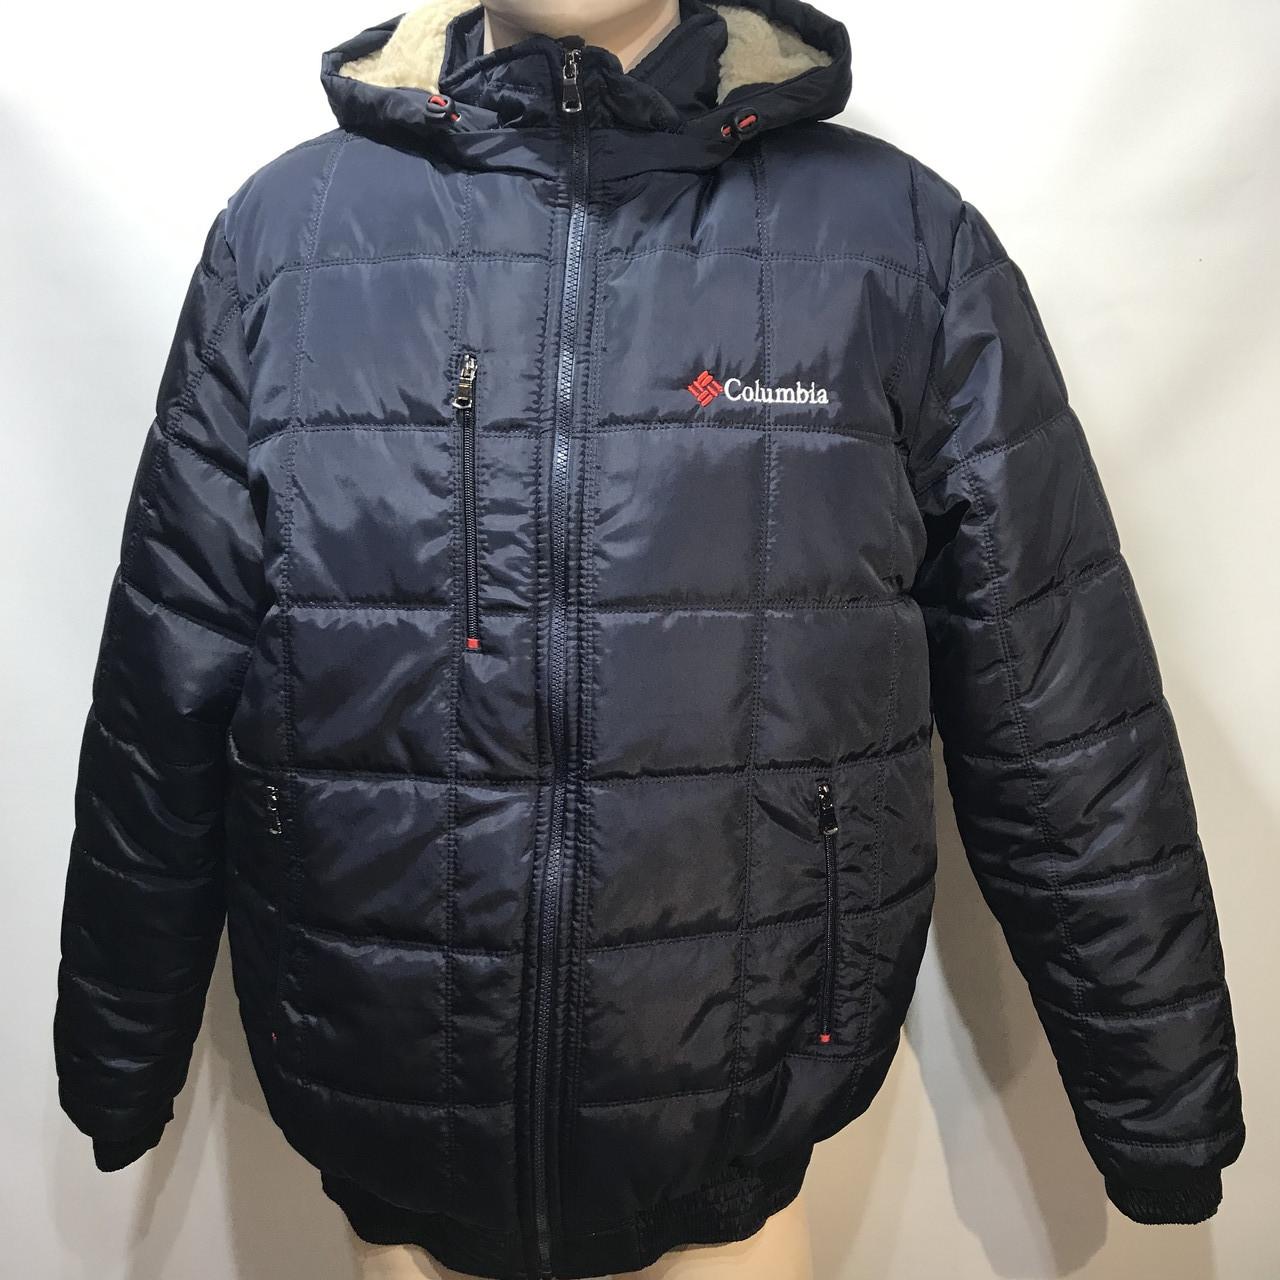 Куртка мужская зимняя на овчине в стиле Columbia плотная ткань р. L, XL, 2XL, 58